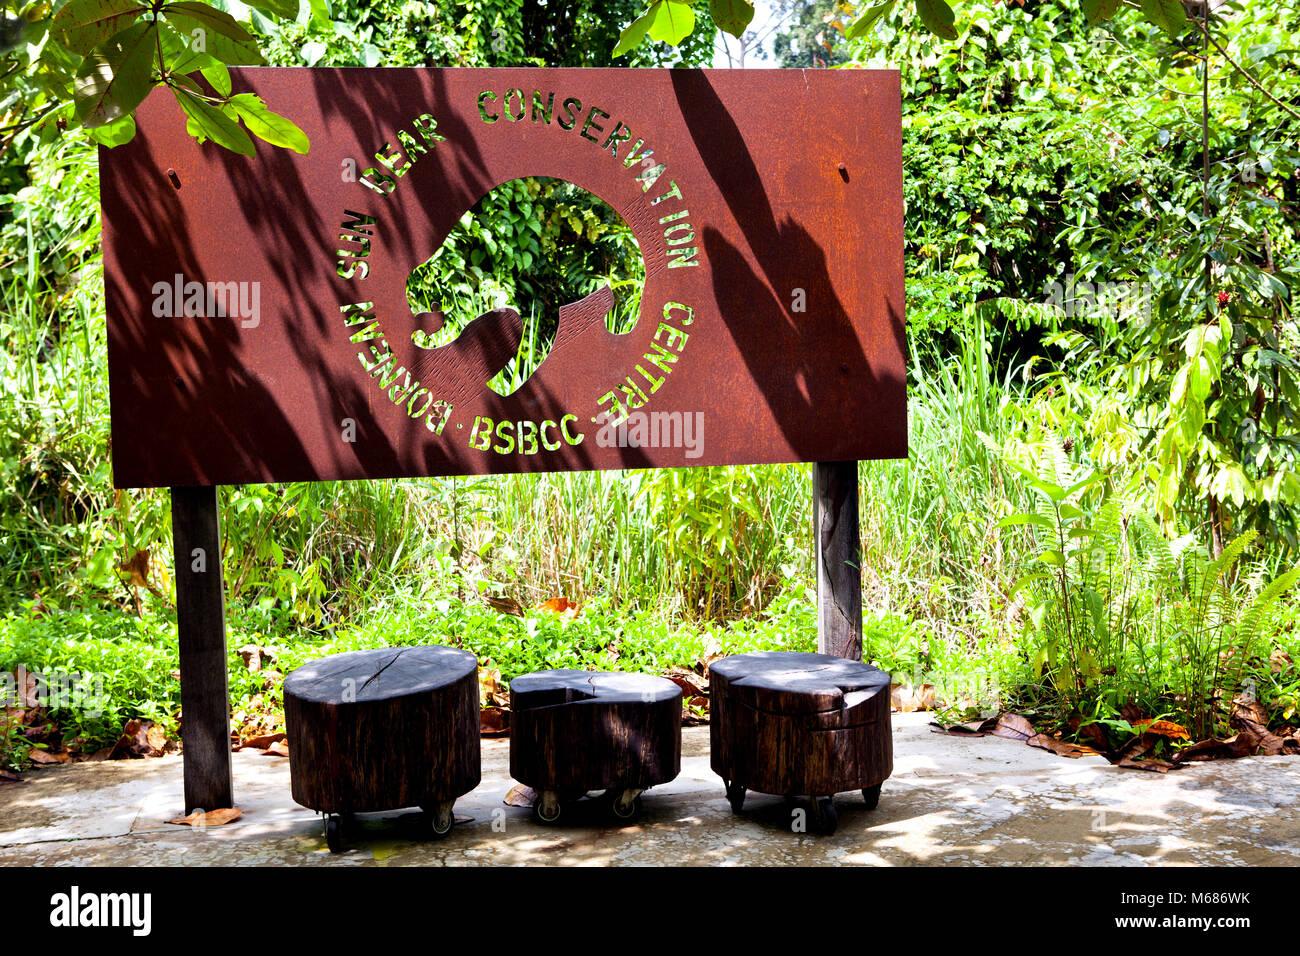 Bornesischen Sun Bear Conservation Centre (BSBCC) Stockfoto